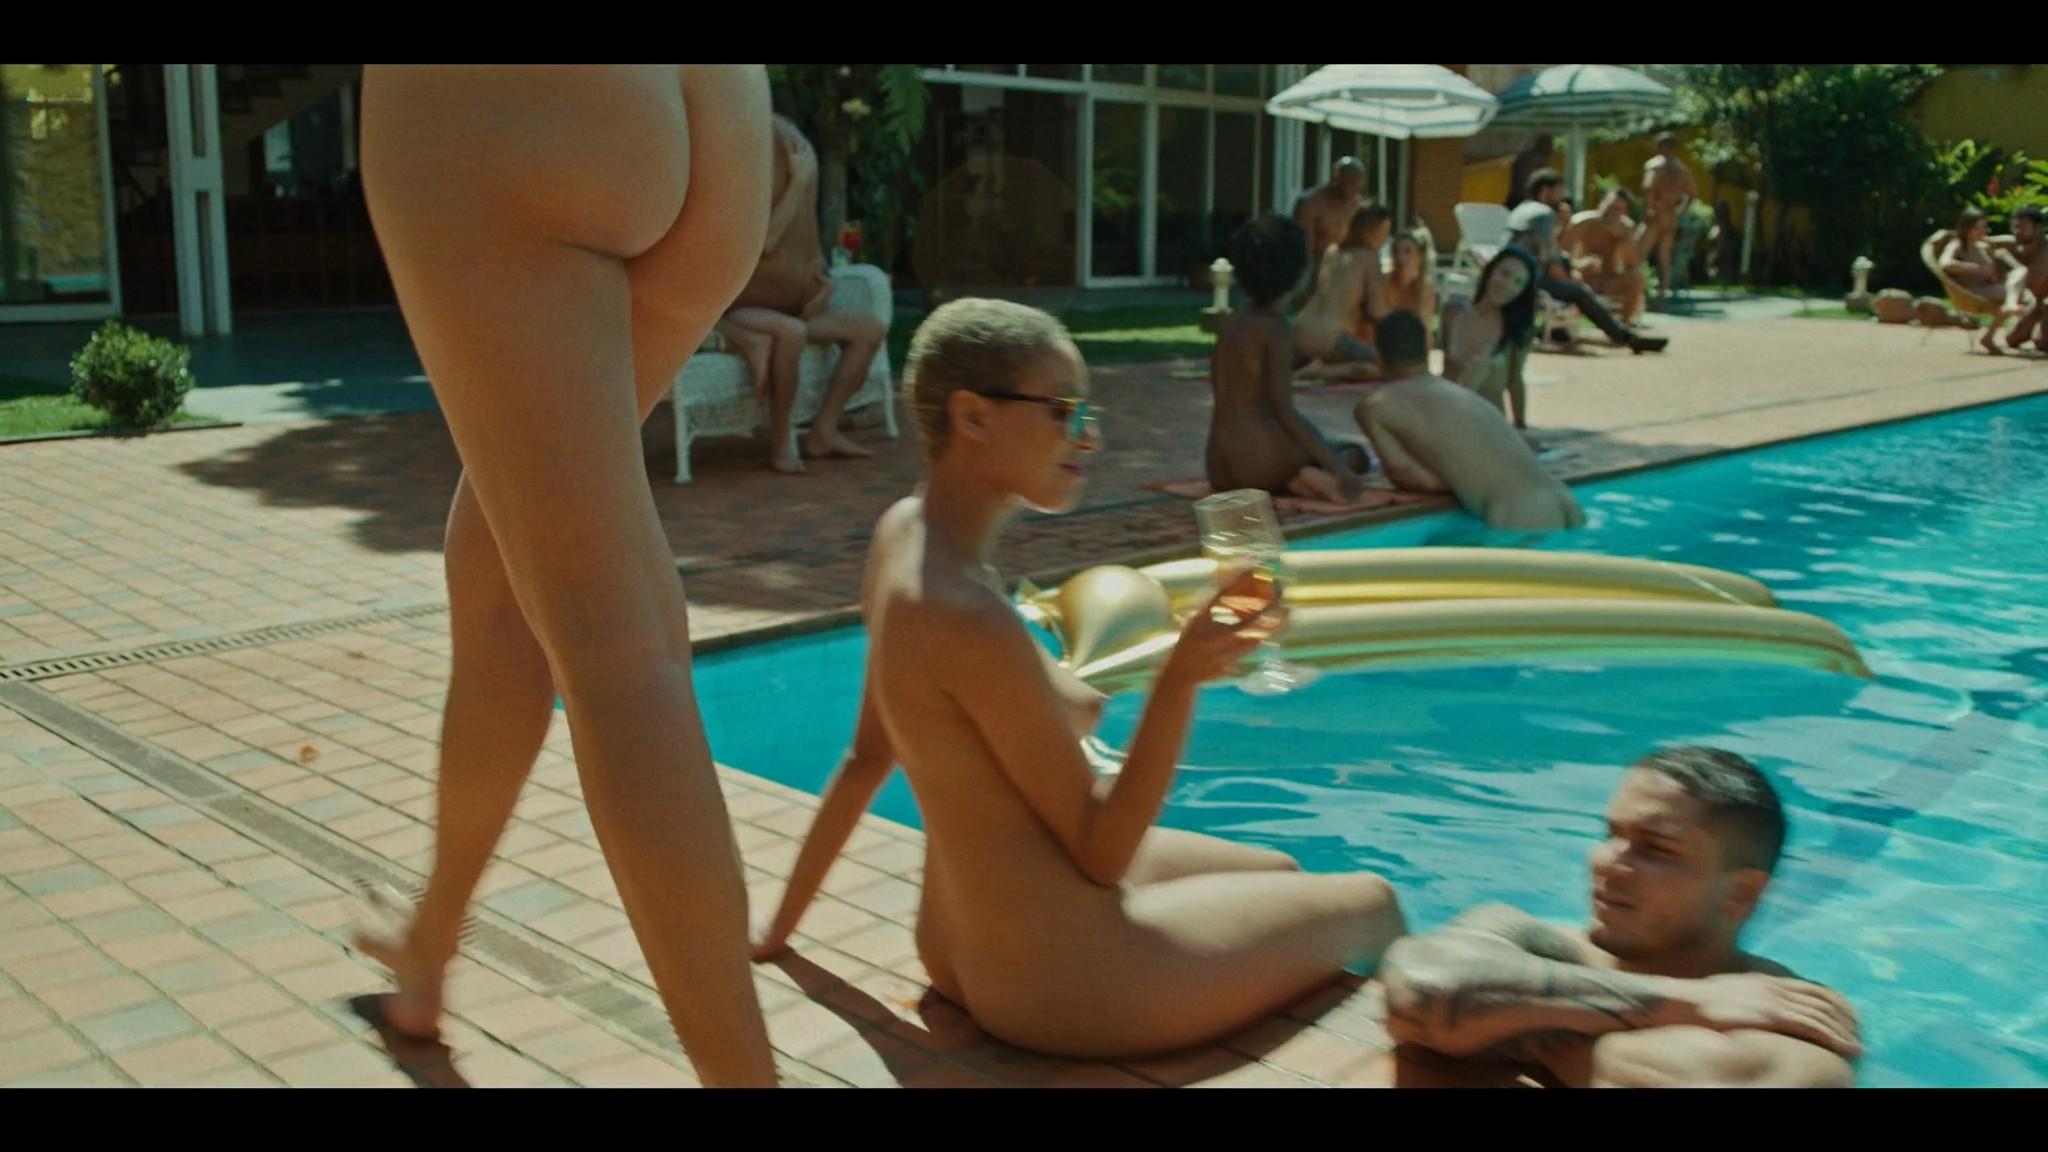 Natalia Lage nude sex Brunna Martins Juliana Bebe and oters nude too Hard 2021 s2e4 6 1080p Web 11